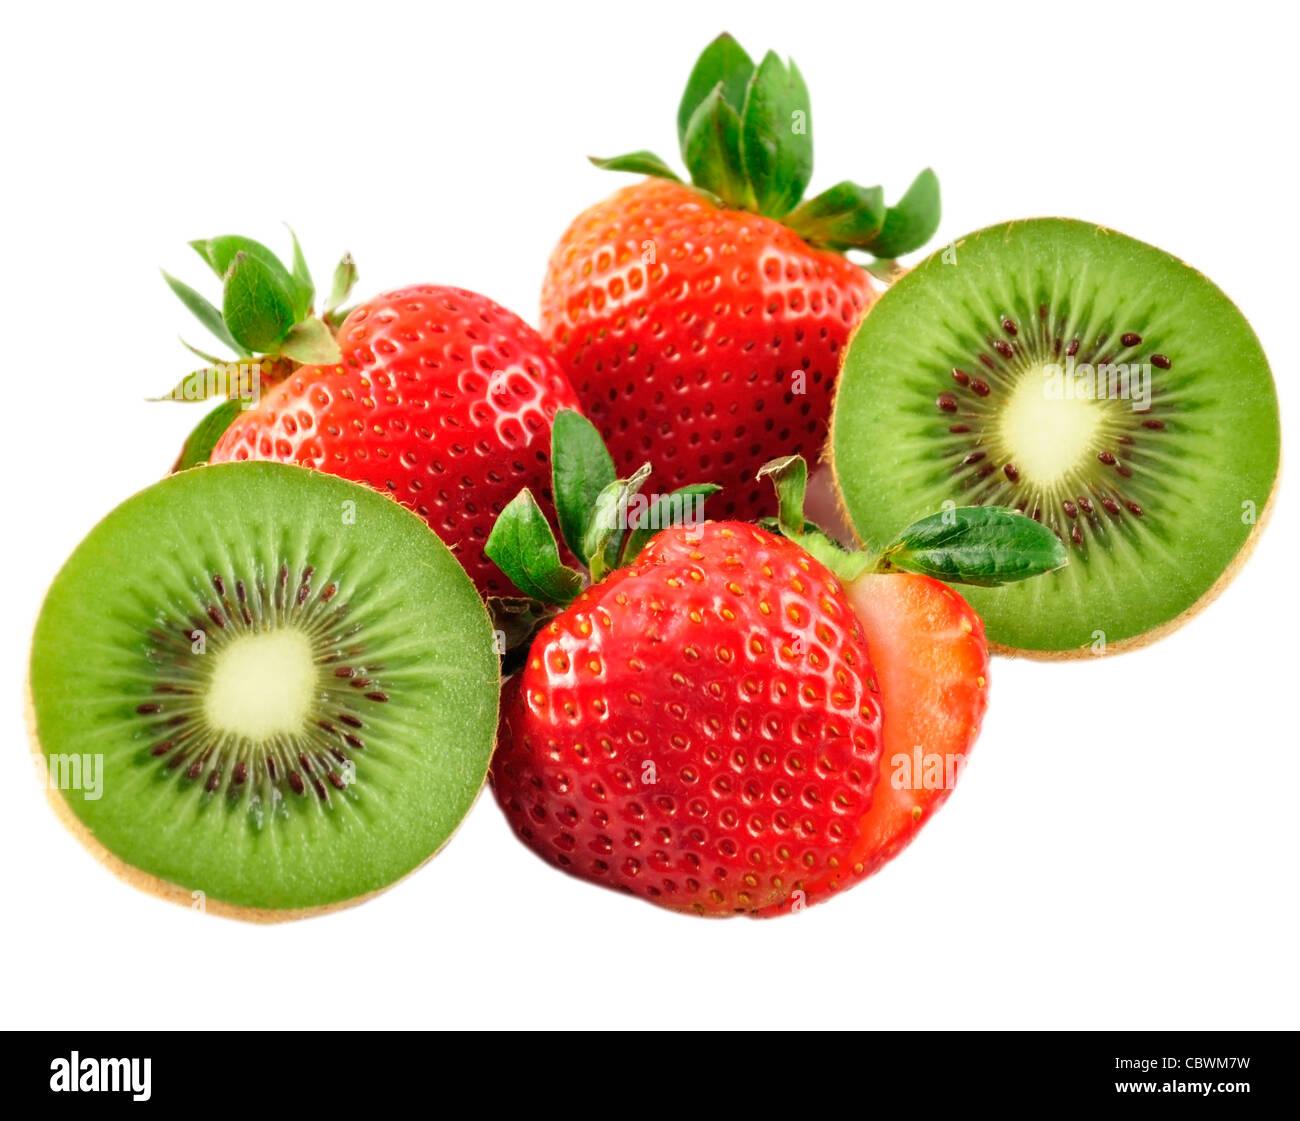 strawberries and kiwi on white background - Stock Image